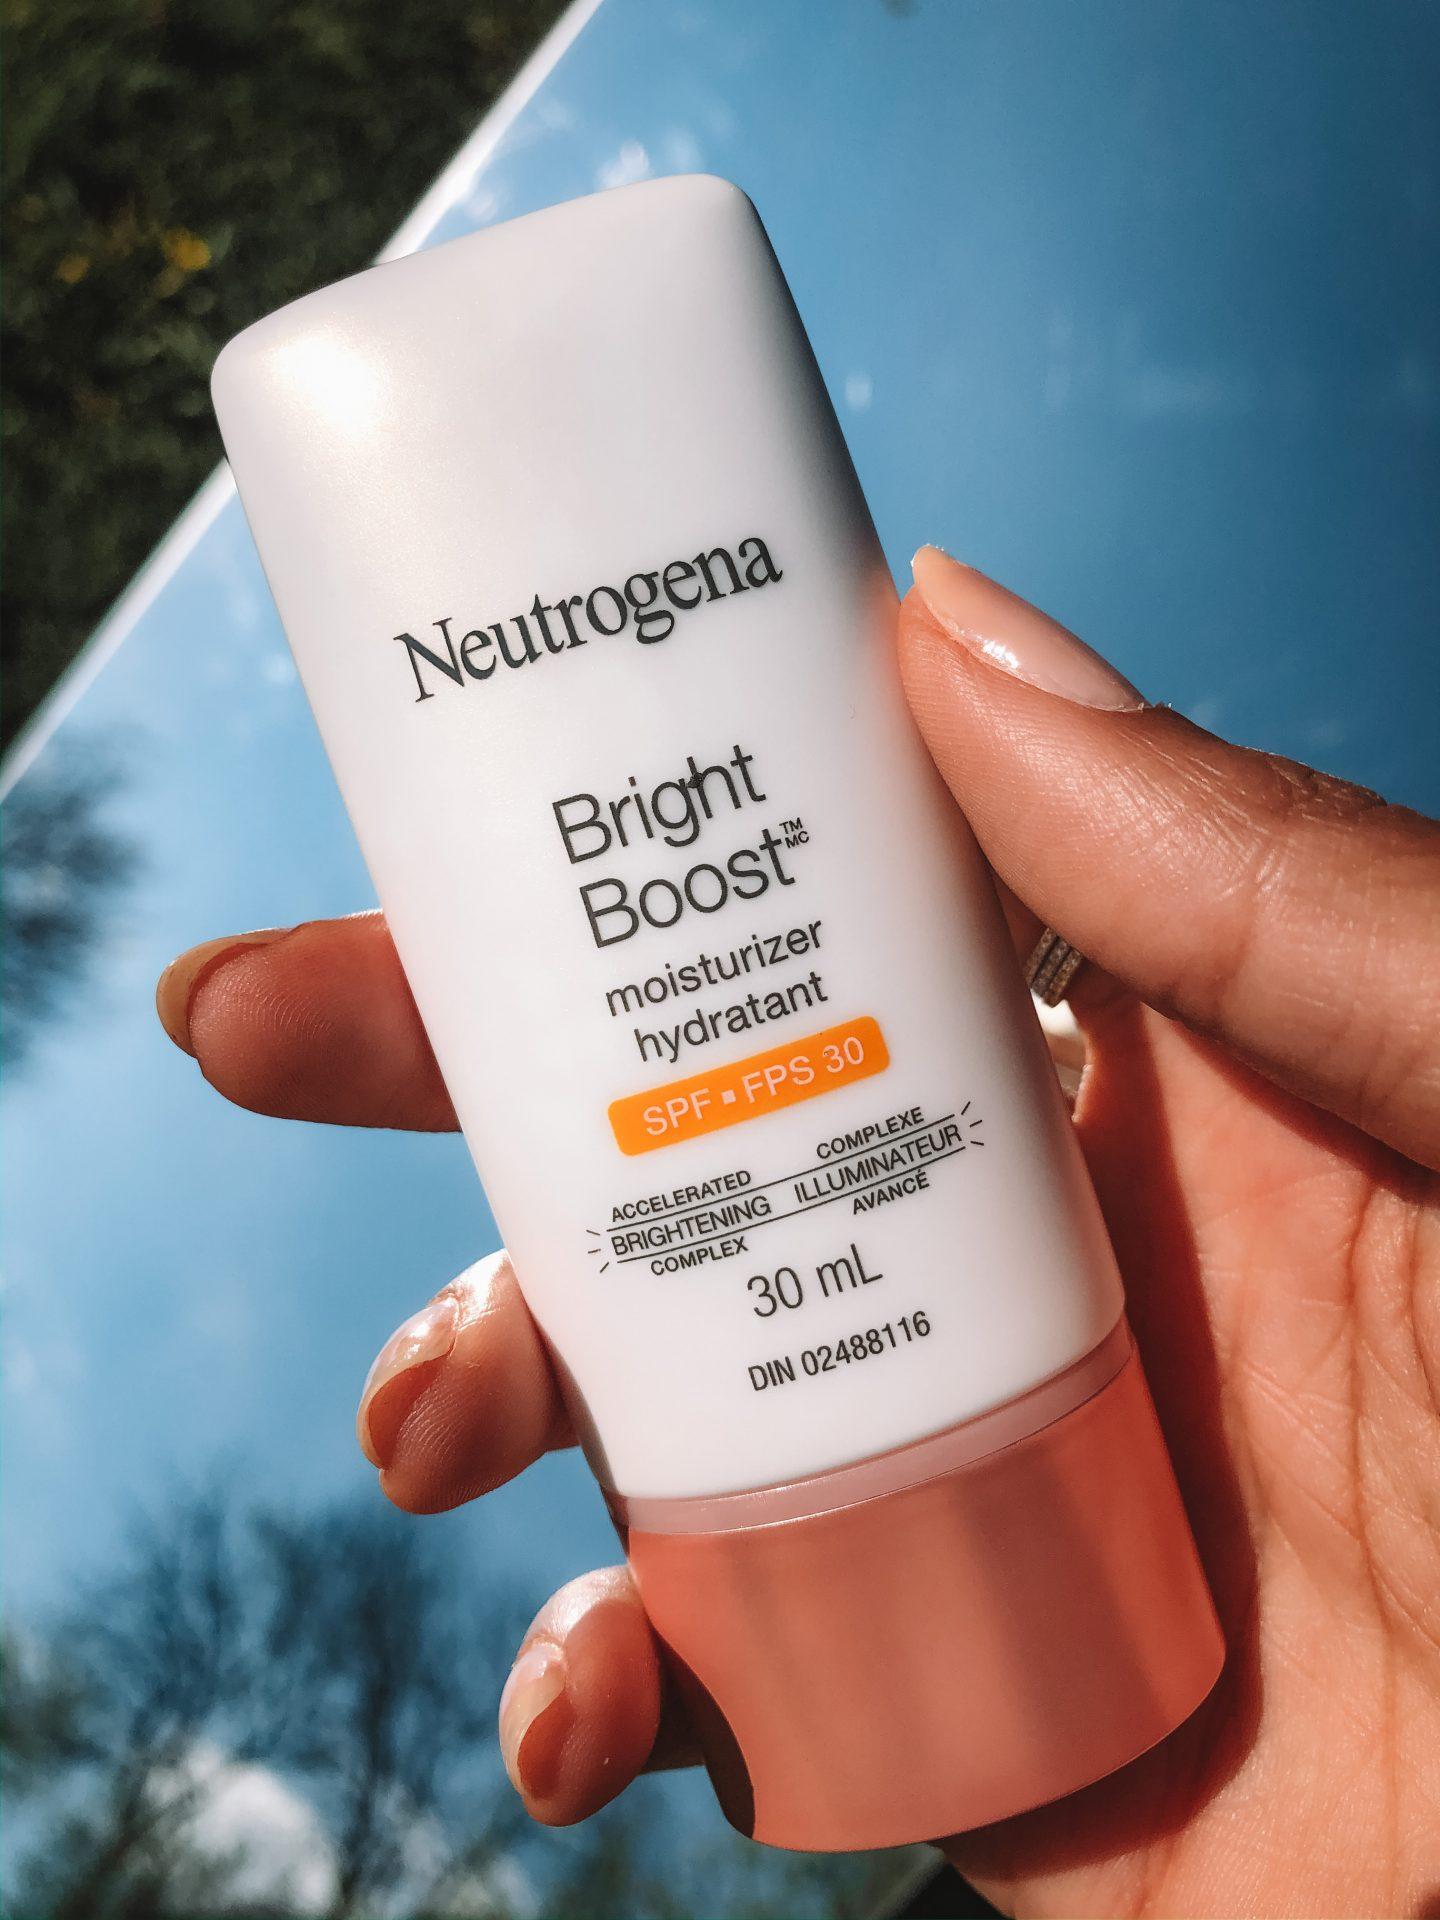 Neutrogena bright boost moisturizer hydrant